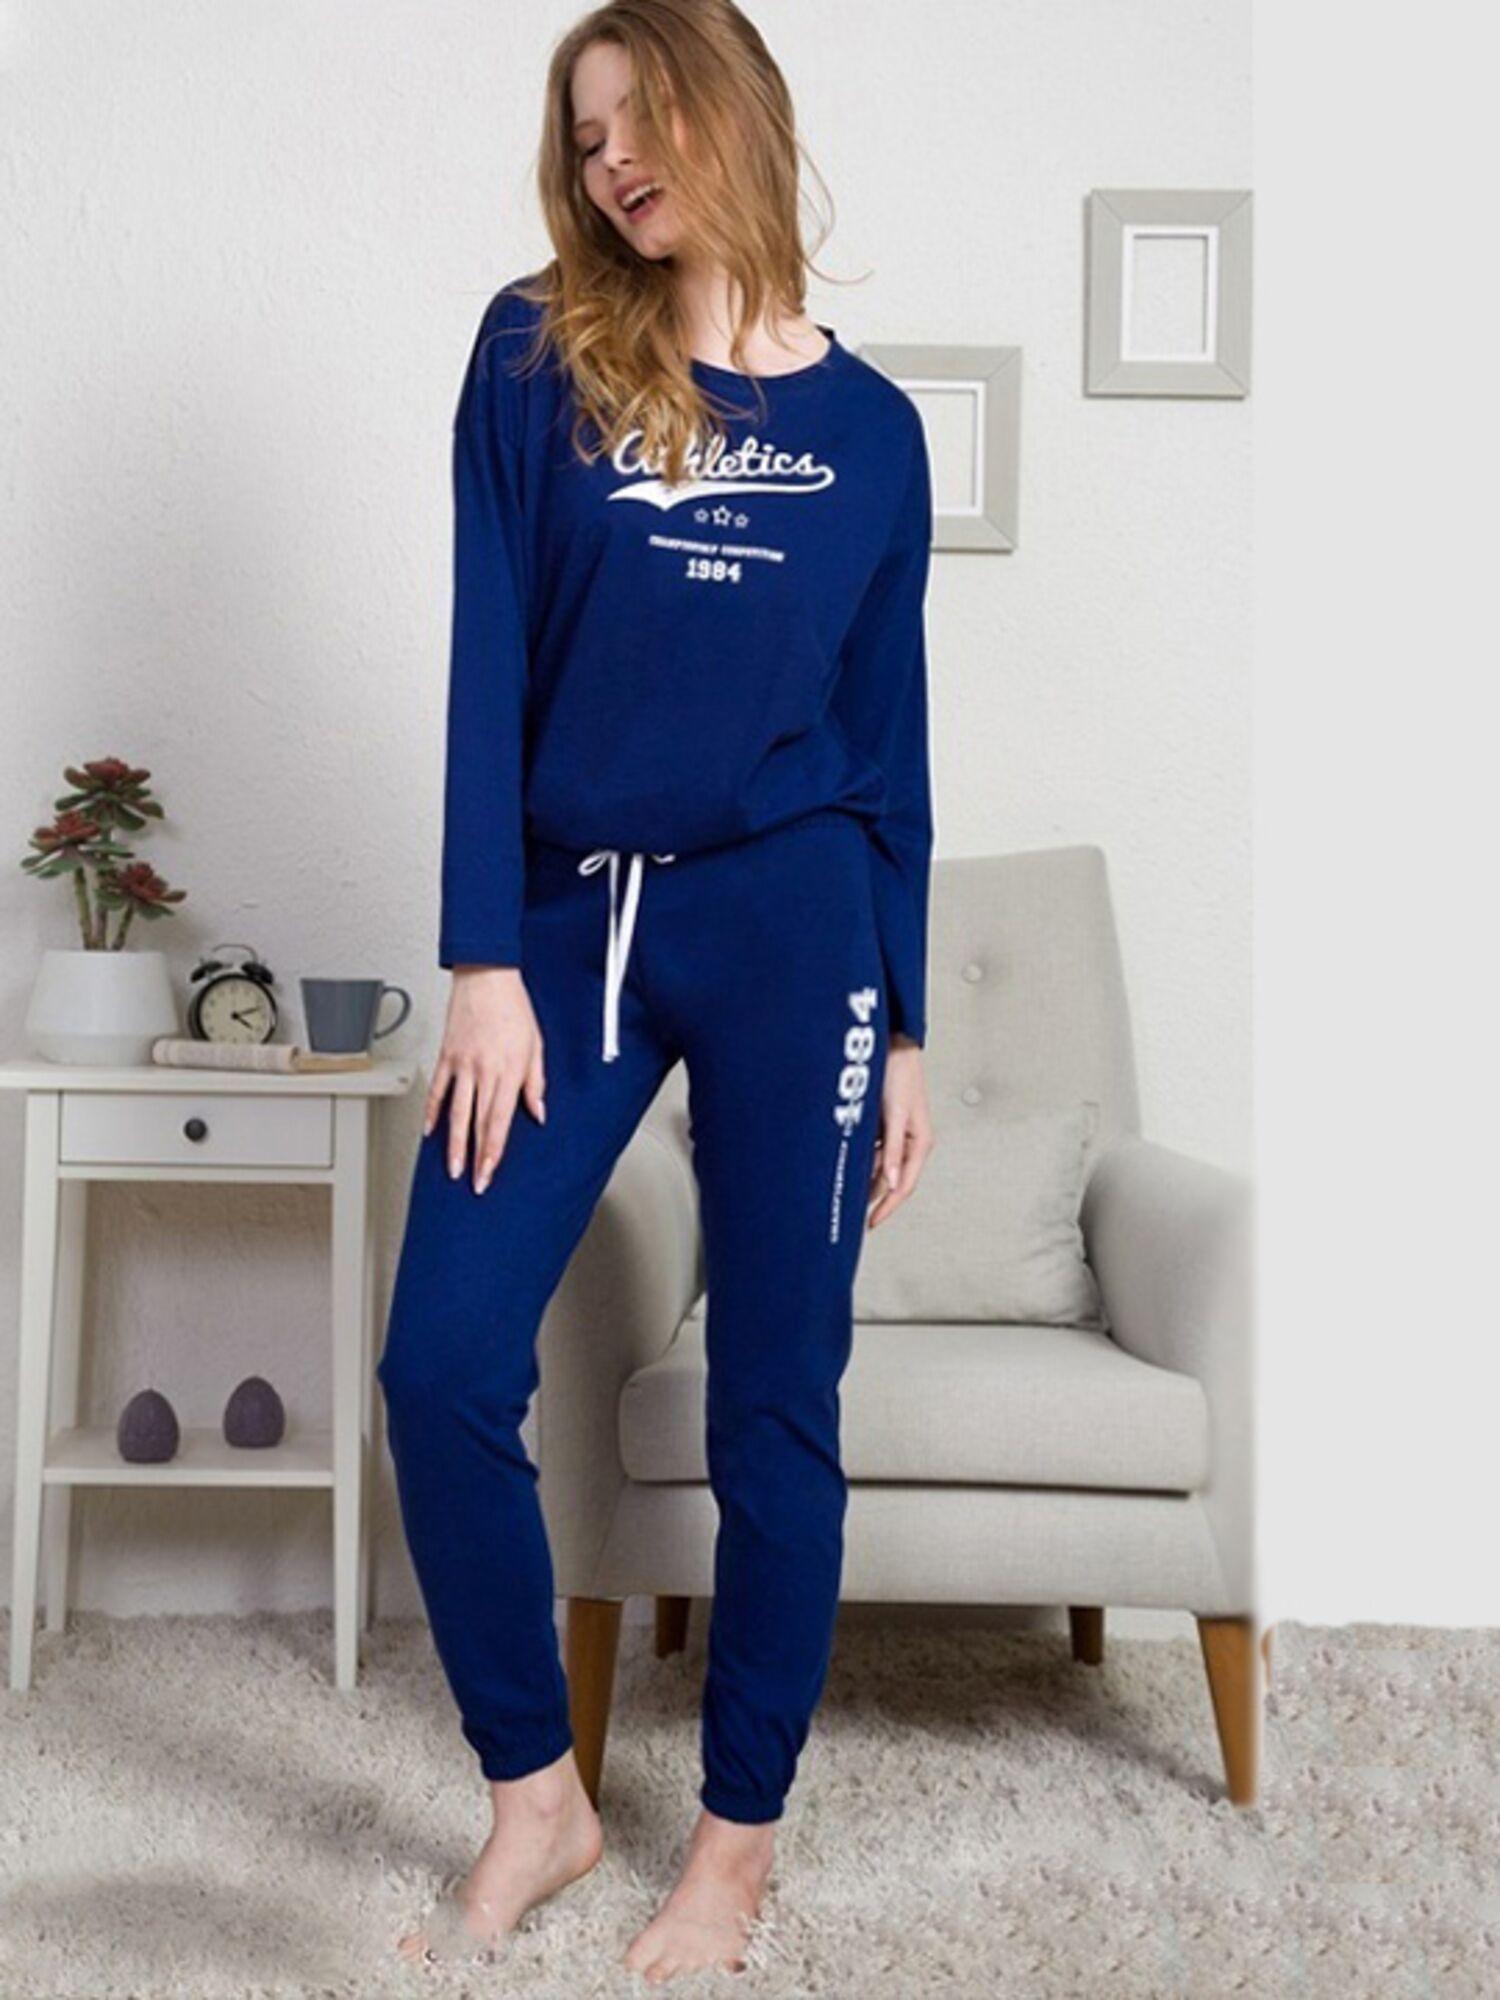 Комплект с брюками №003022 0000, синий, Vienetta